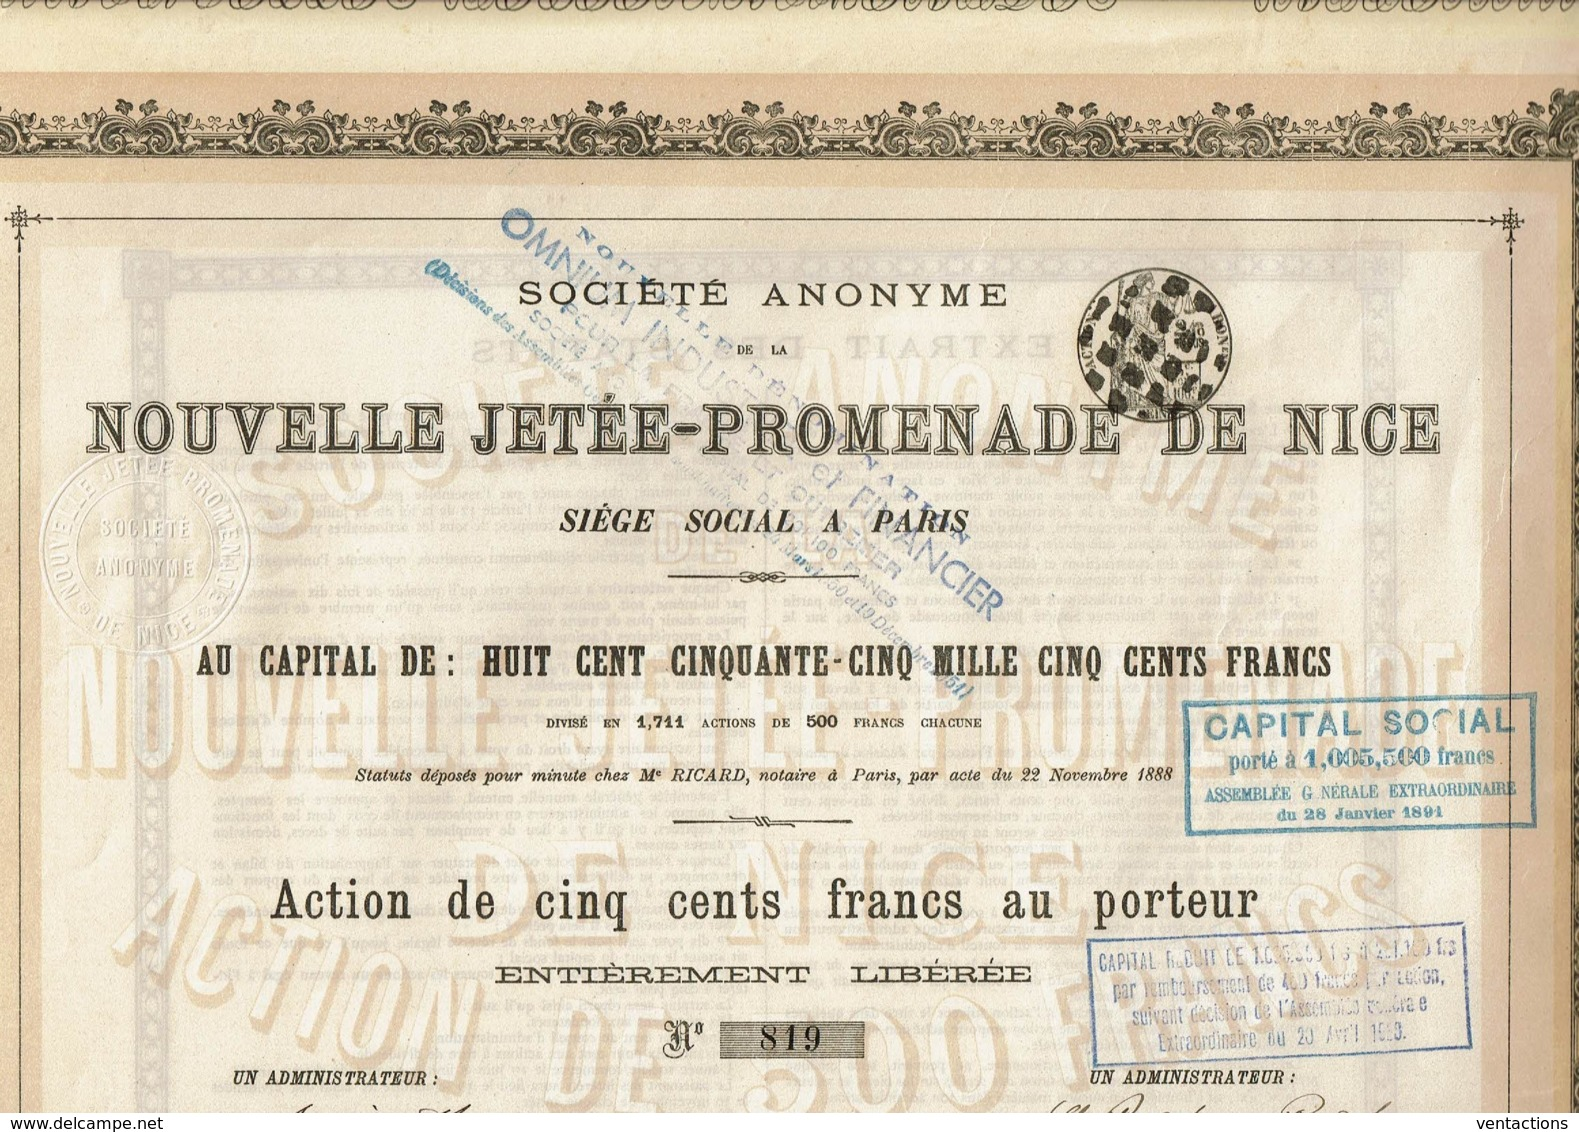 06-NOUVELLE JETEE-PROMENADE DE NICE. OMNIUM INDUST & FINANCIER FRANCE & OUTREMER - Shareholdings